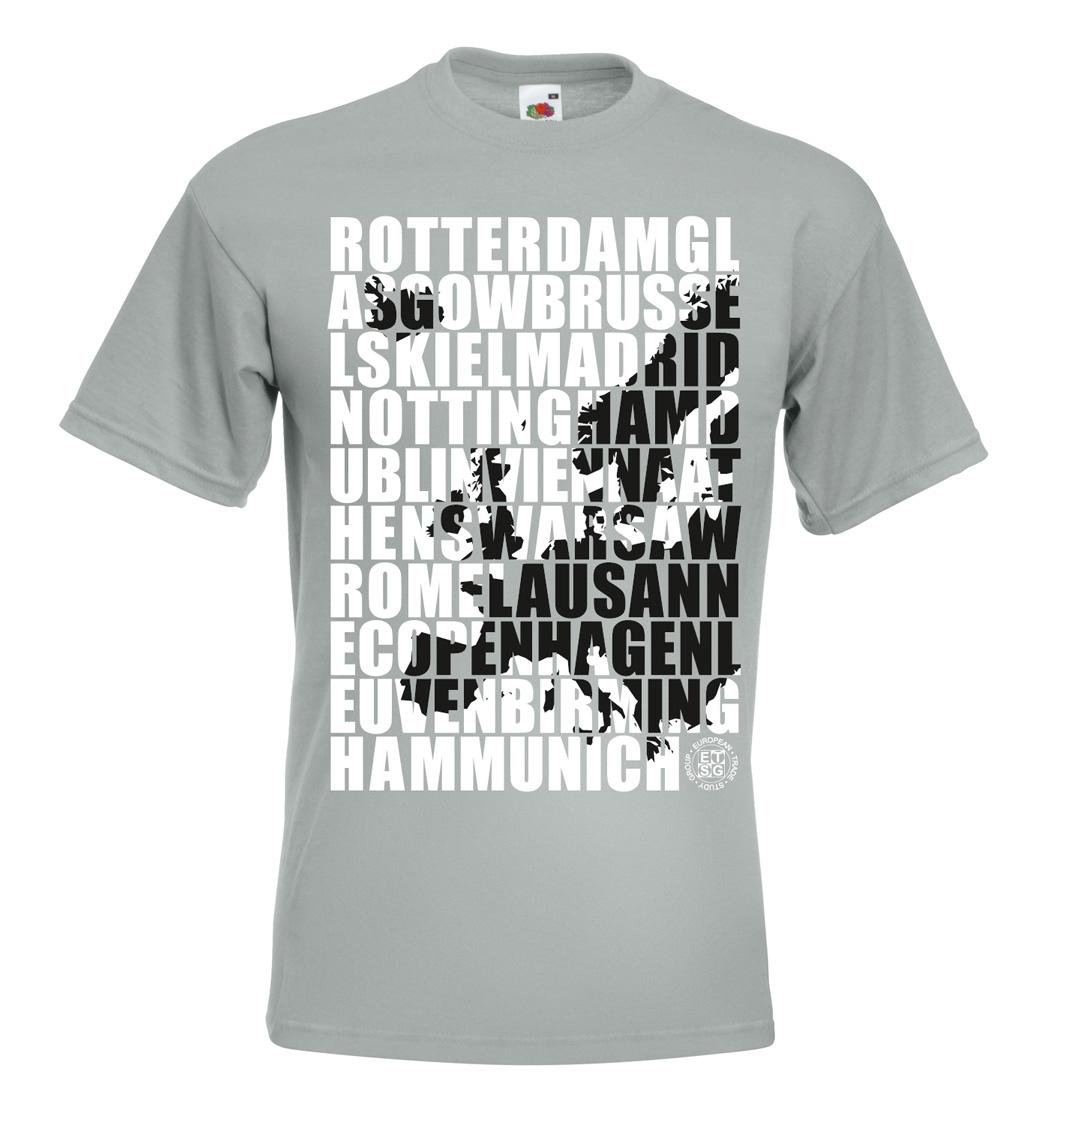 ETSG tour t-shirt